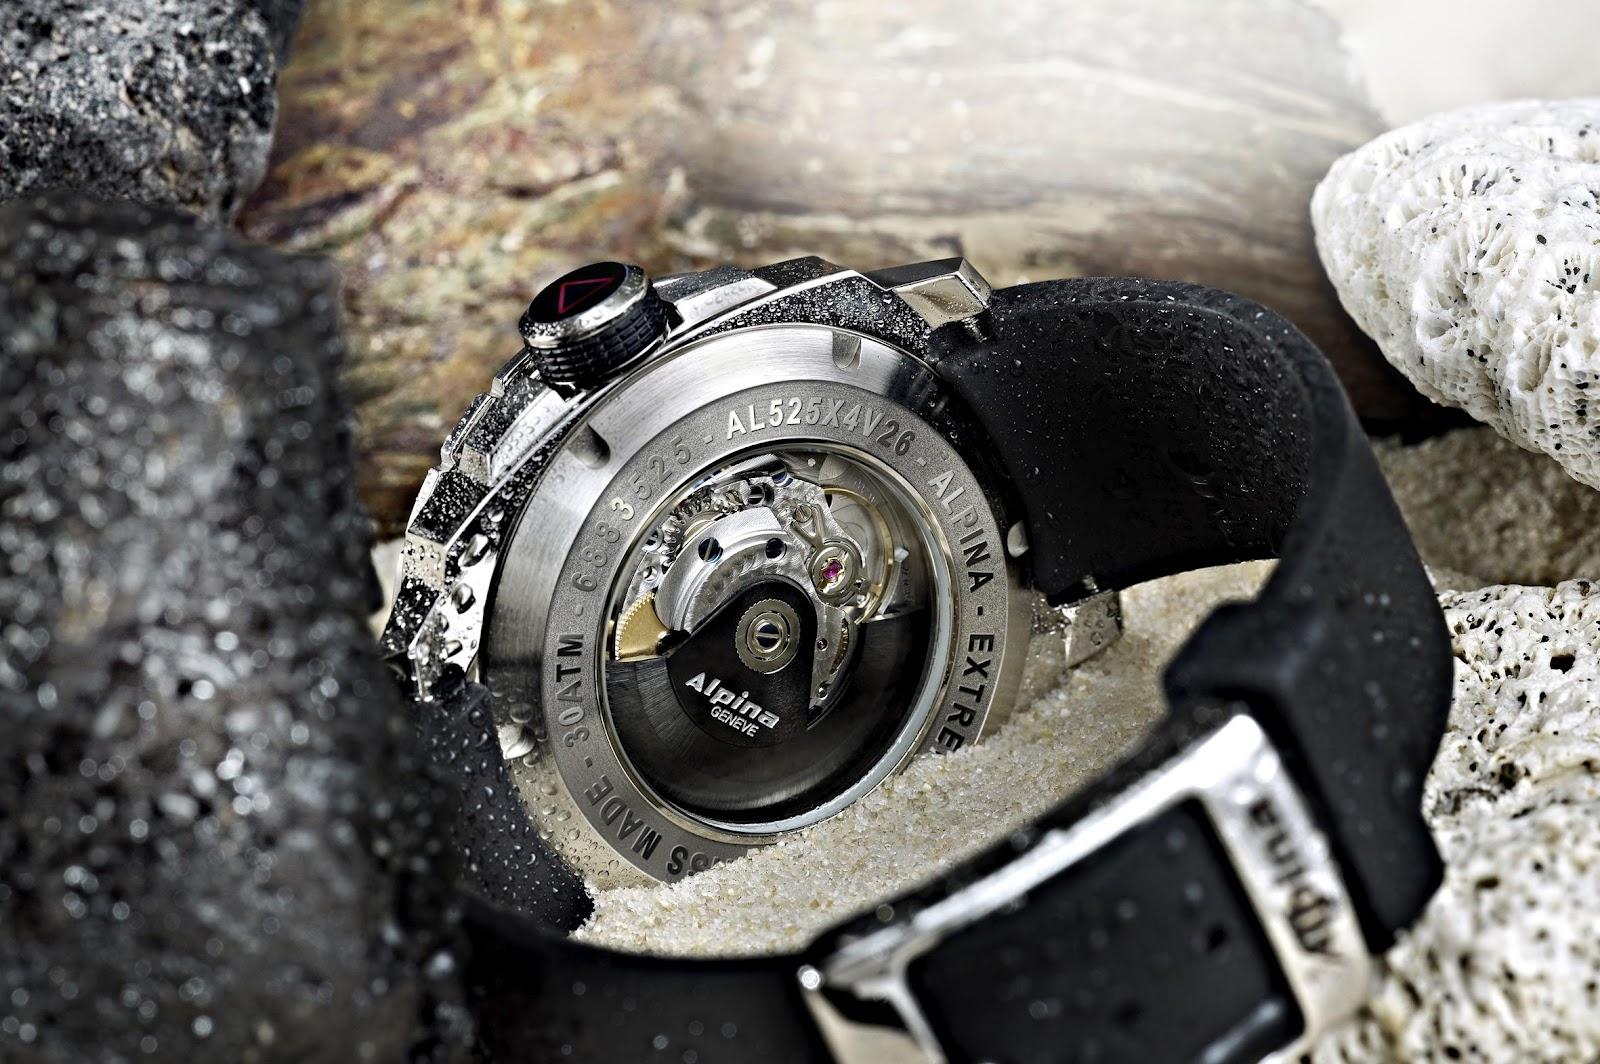 http://2.bp.blogspot.com/-cFqQfJ_fDqw/UERrmowQrZI/AAAAAAAADLc/yWsScBv-D14/s1600/Alpina+Extreme+Diver+reverse.jpg